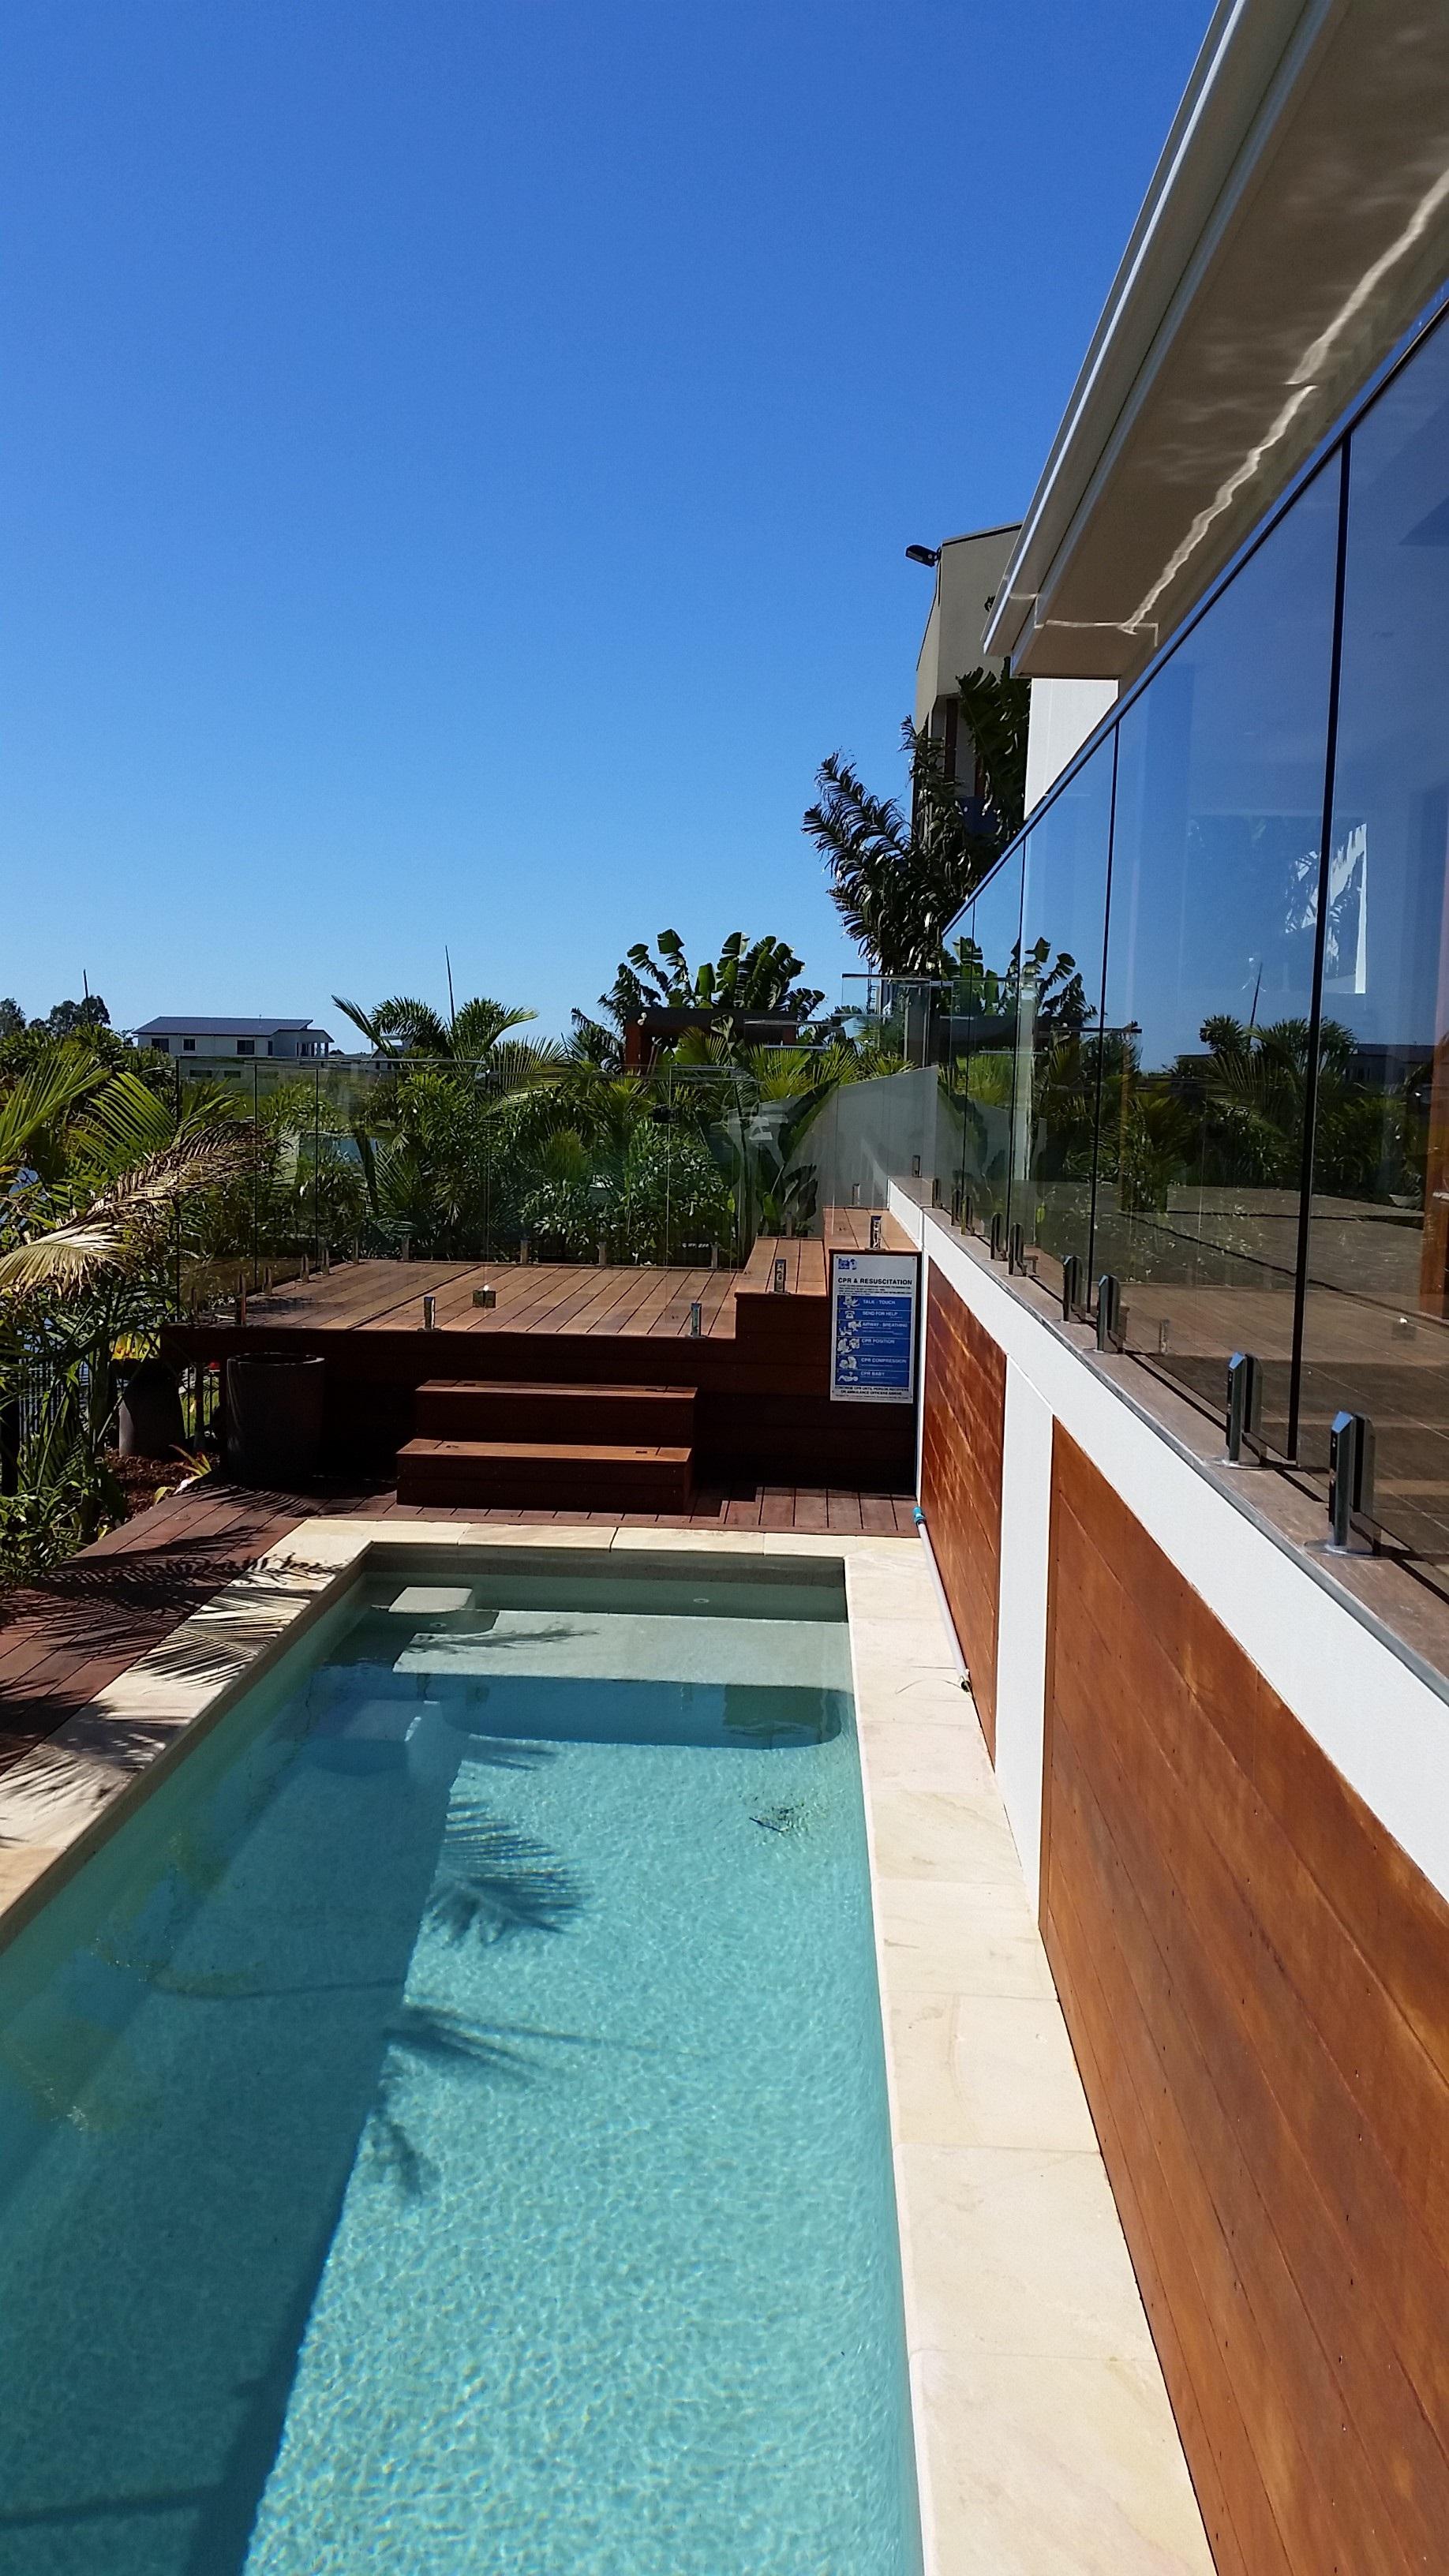 Quality Glass Pool Fencing Gold Coast